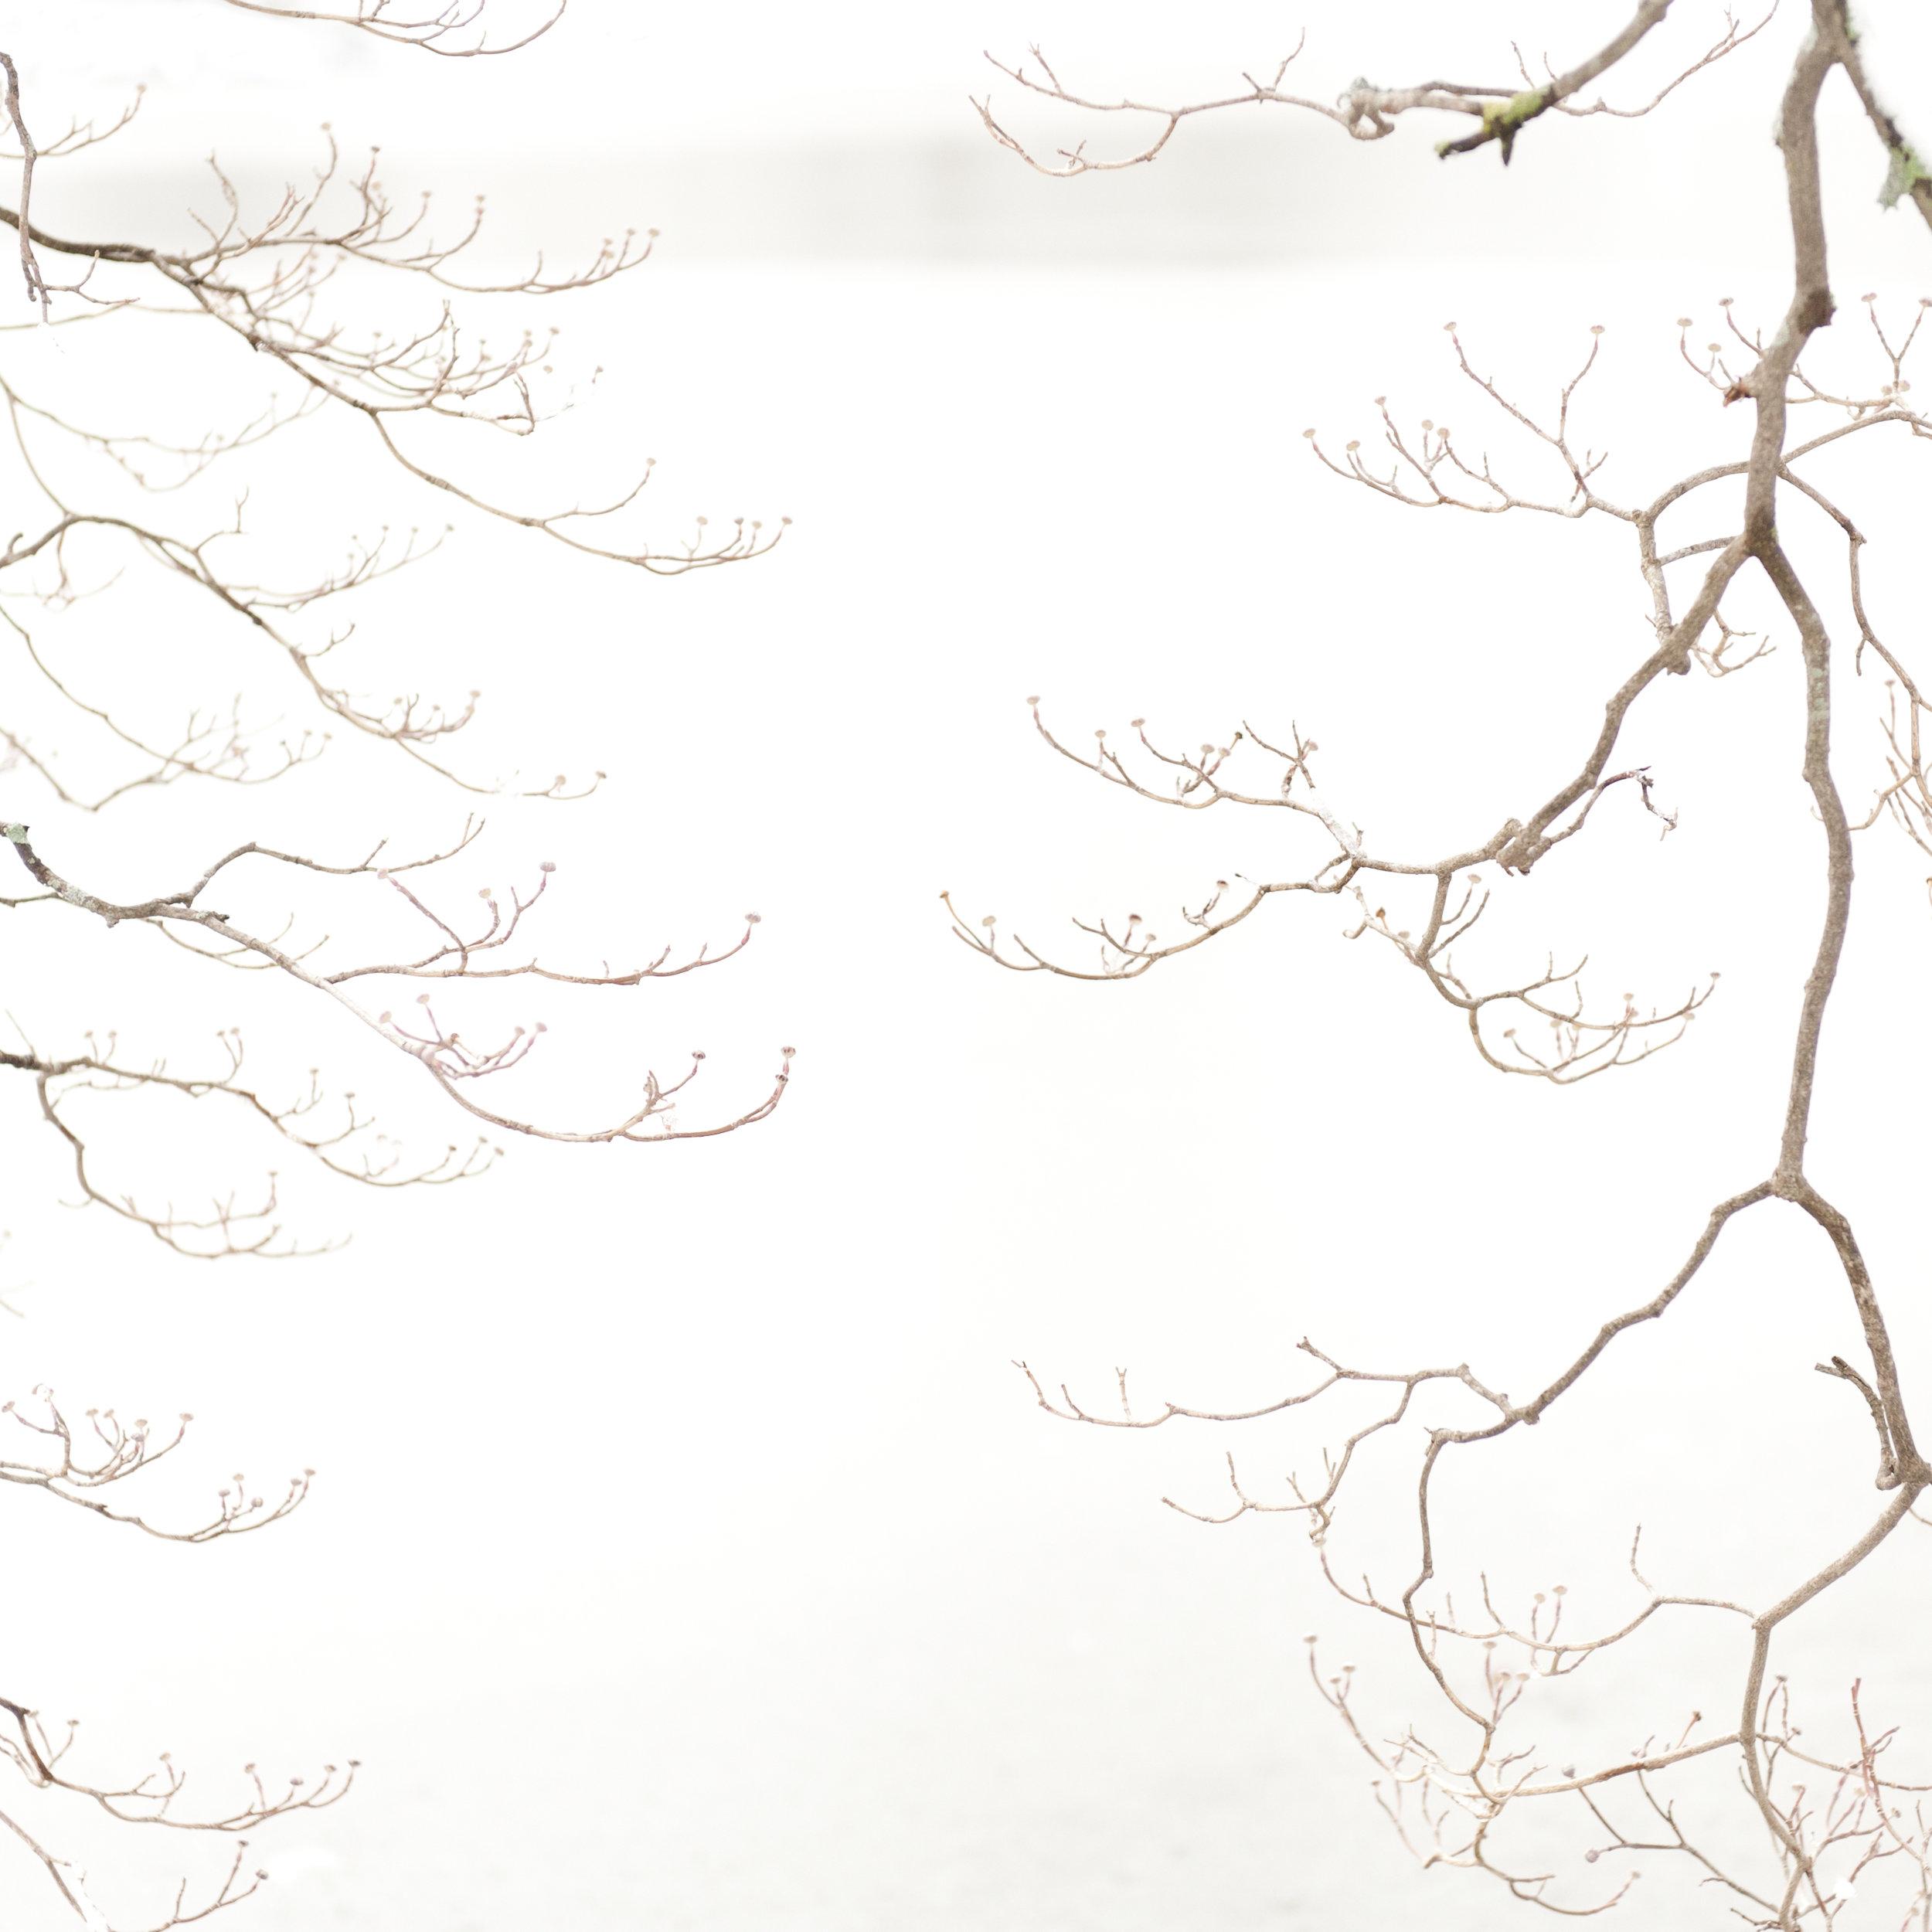 Study in Snow, Dogwood Tree, 7